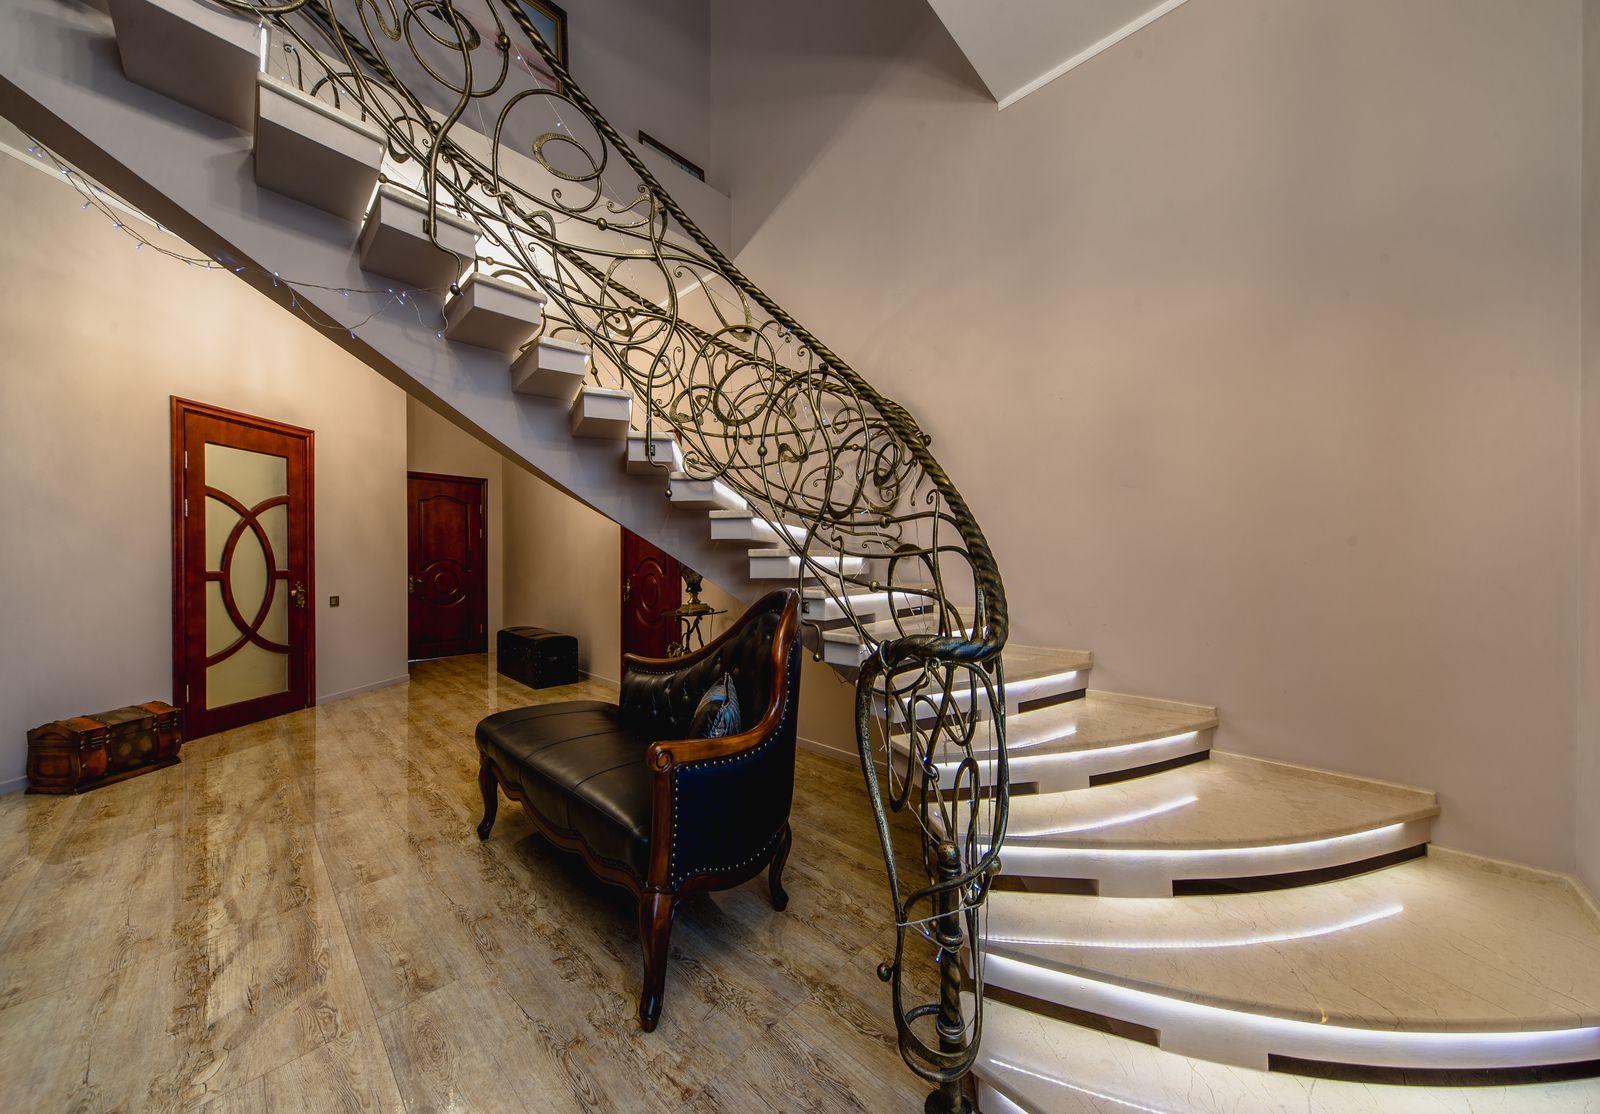 Detalle de la escalera